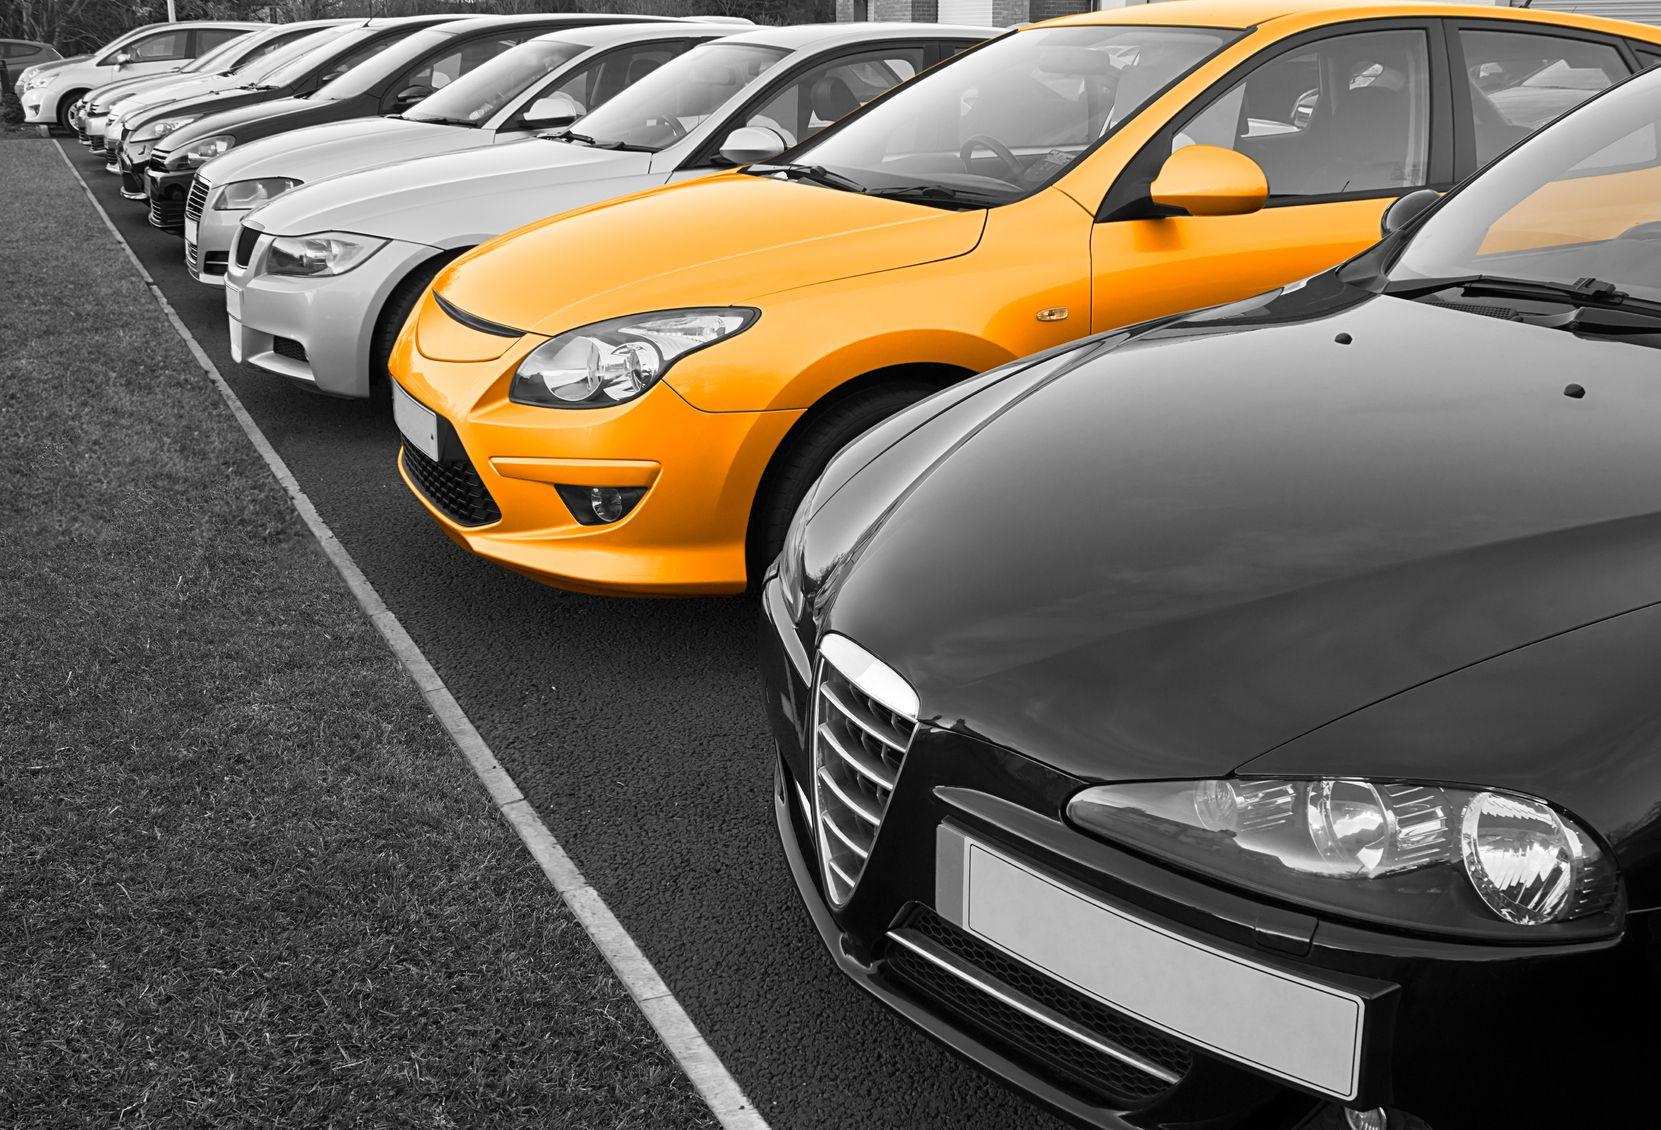 Funky Ebay Europe Cars Component - Classic Cars Ideas - boiq.info